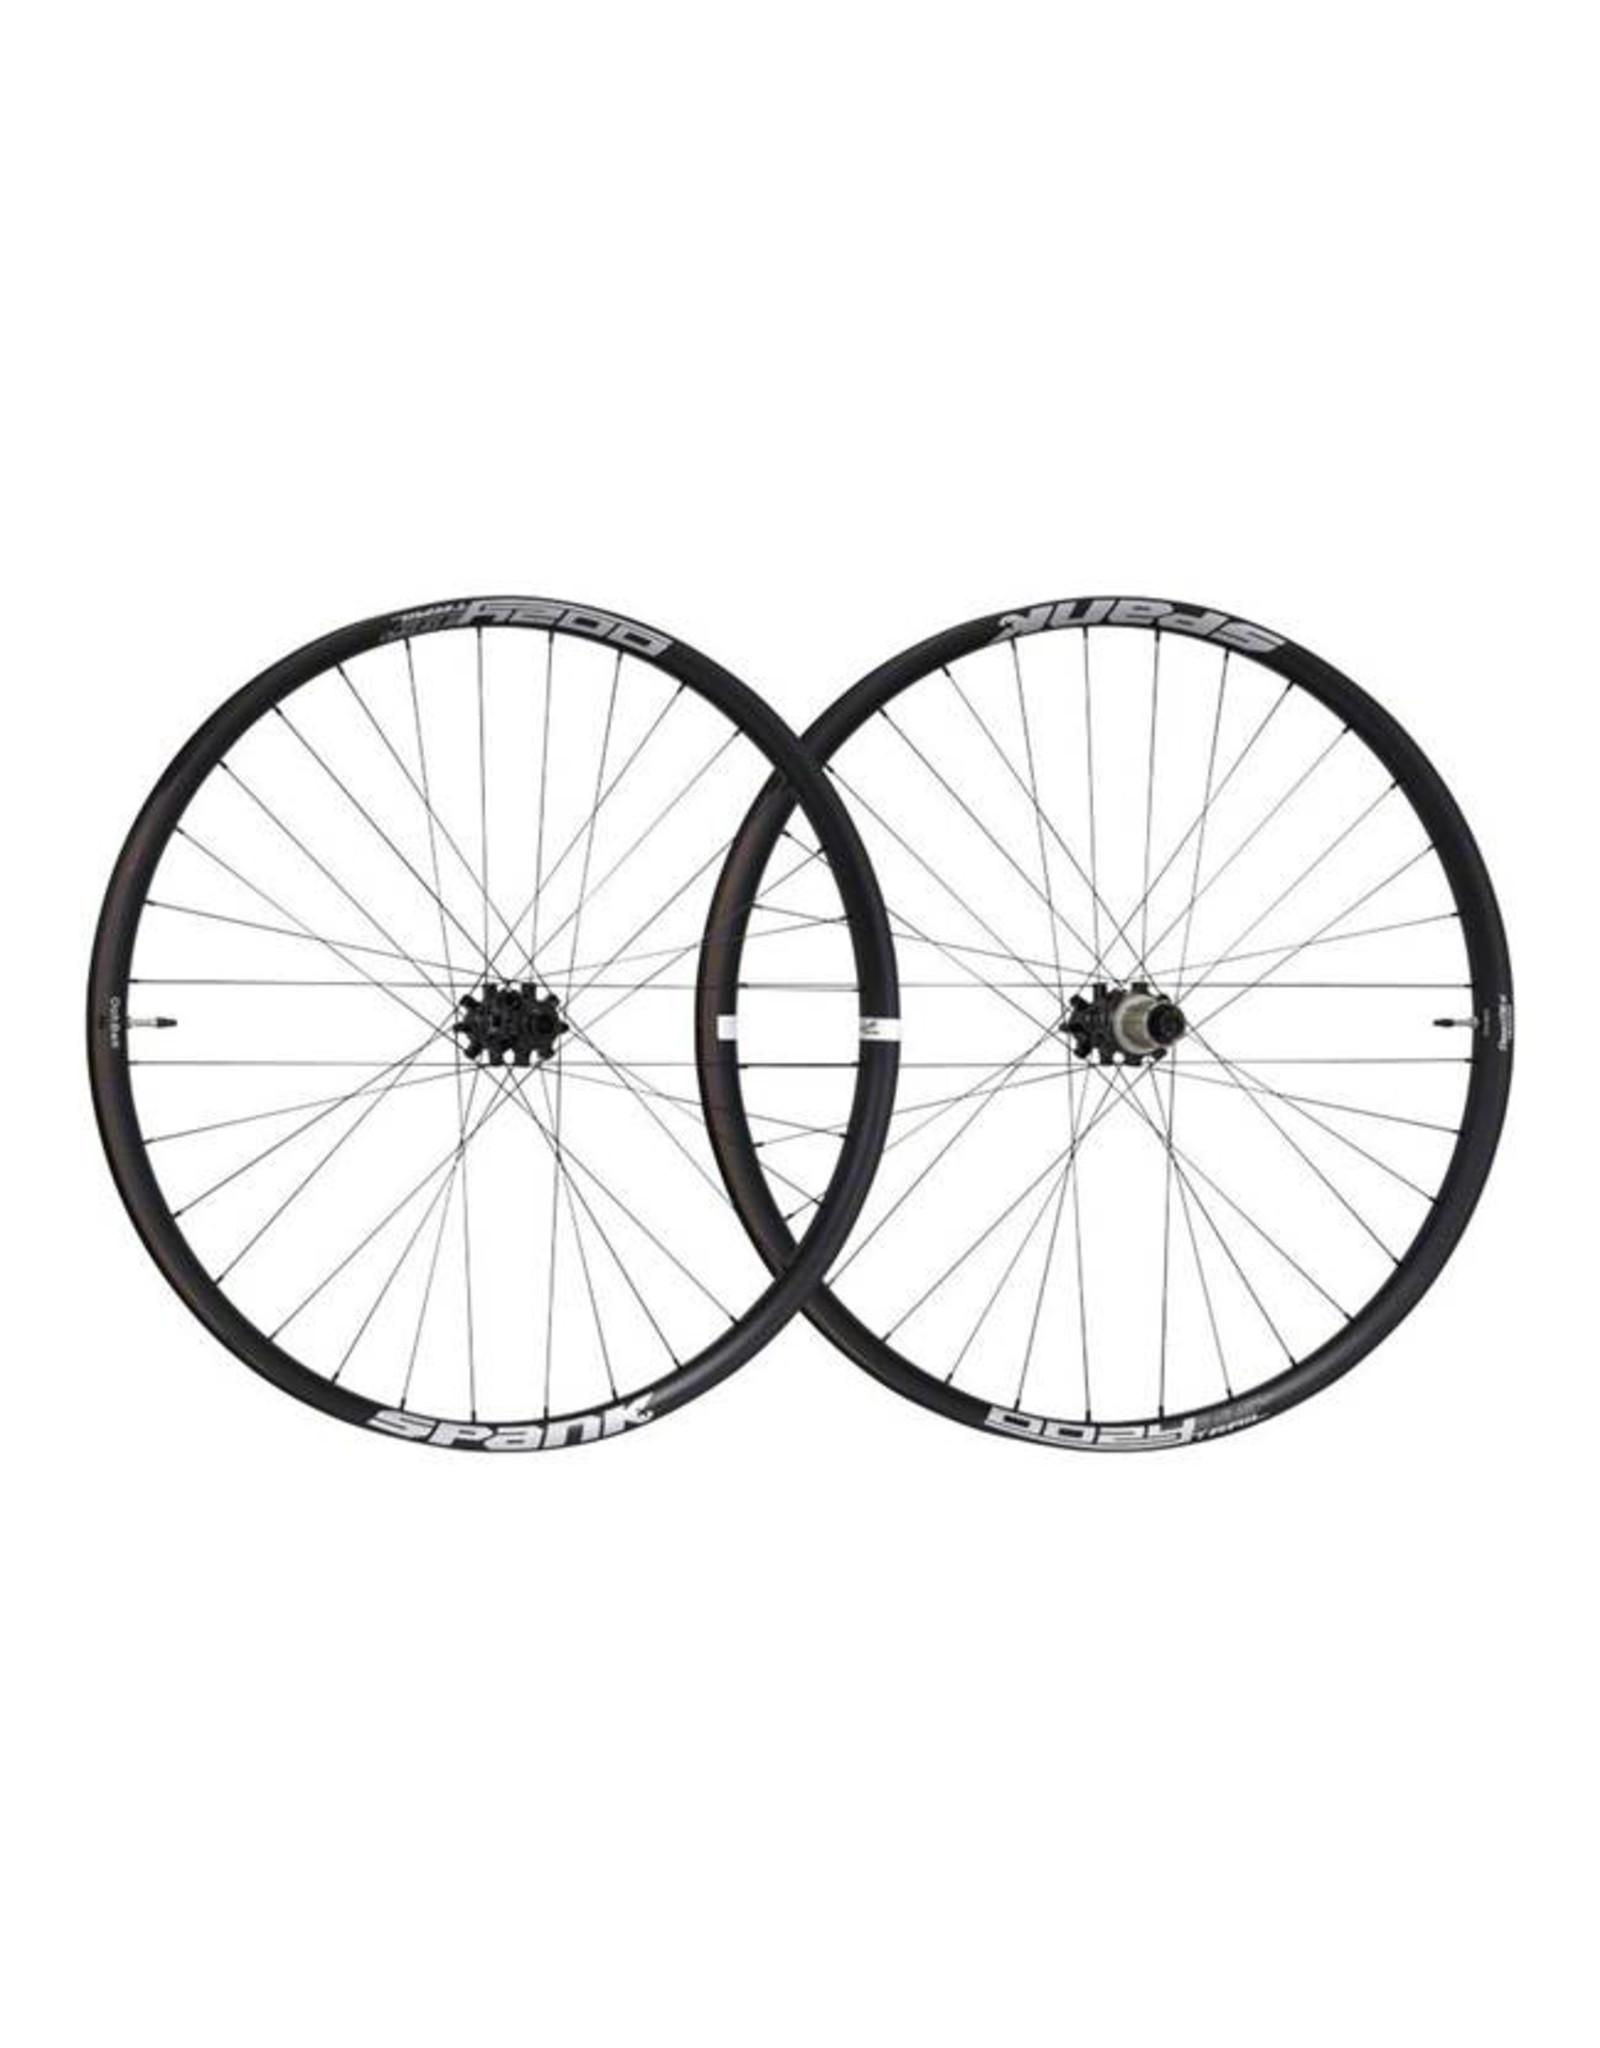 Spank Spank Oozy Trail 395+ Wheelset: 27.5+ 15 x 110mm Front 12 x 148mm Rear Shimano 10/11 MTB Freehub Black